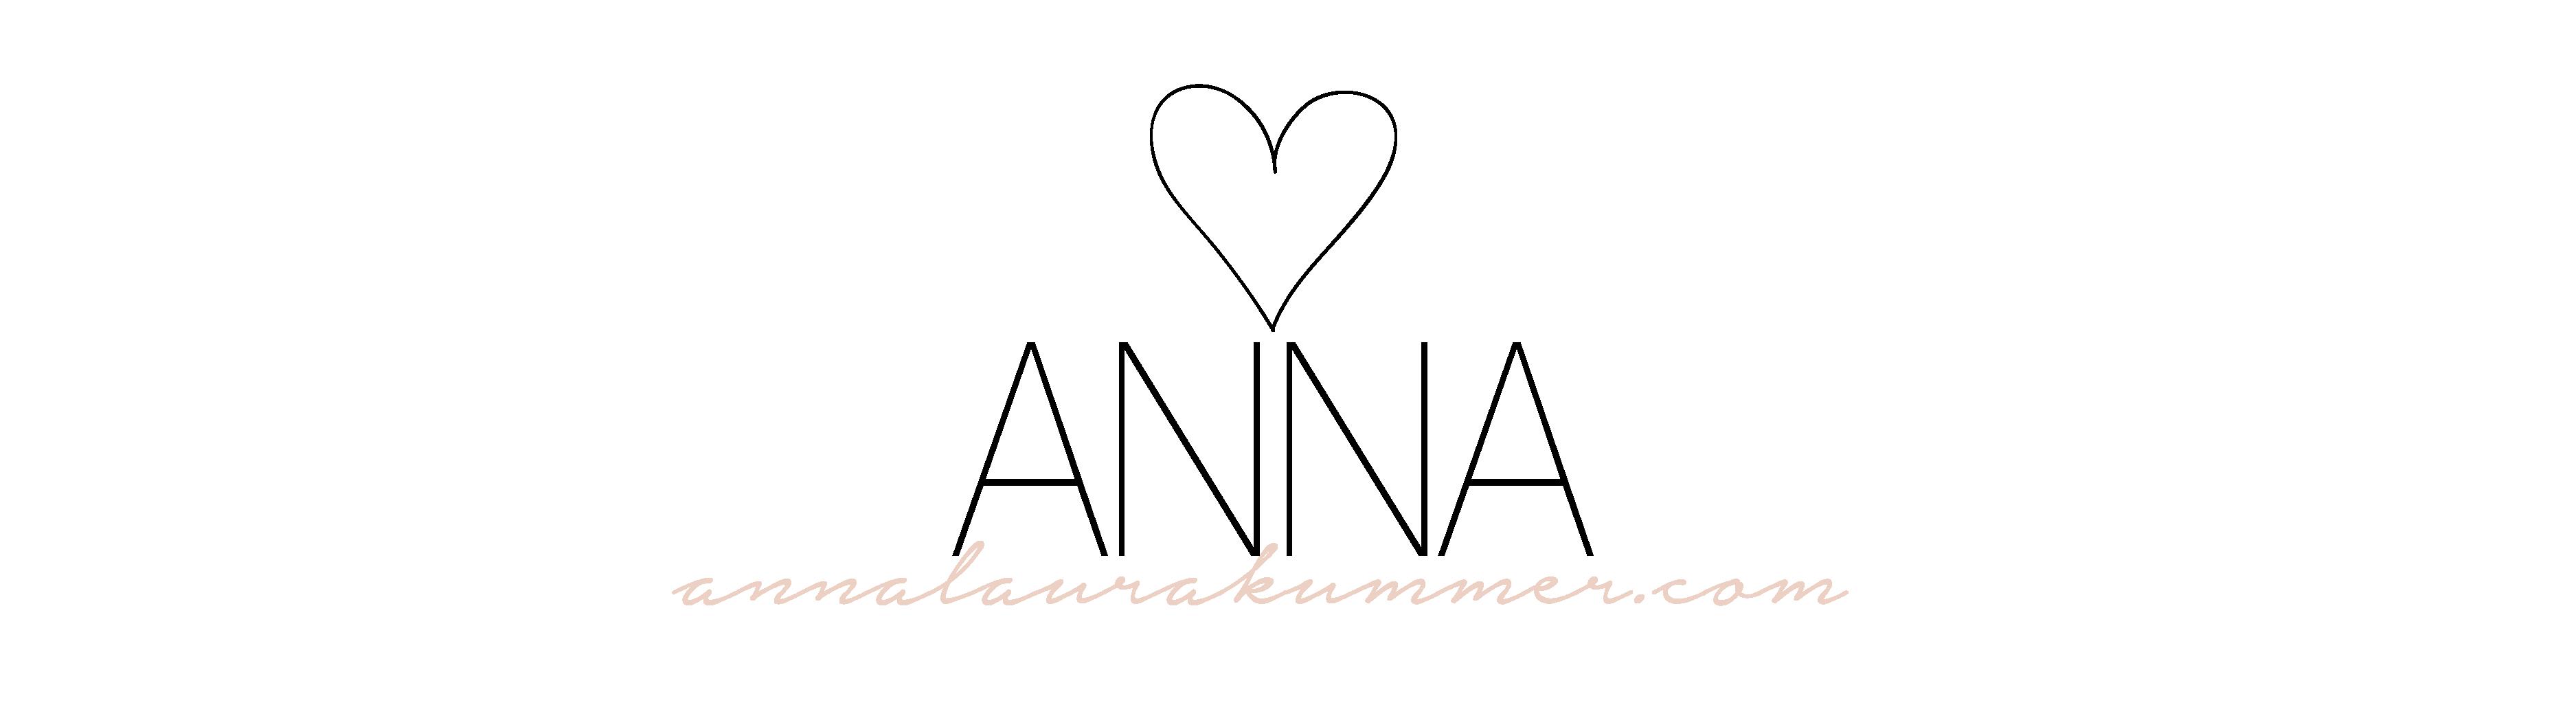 Anna-Laura Kummer